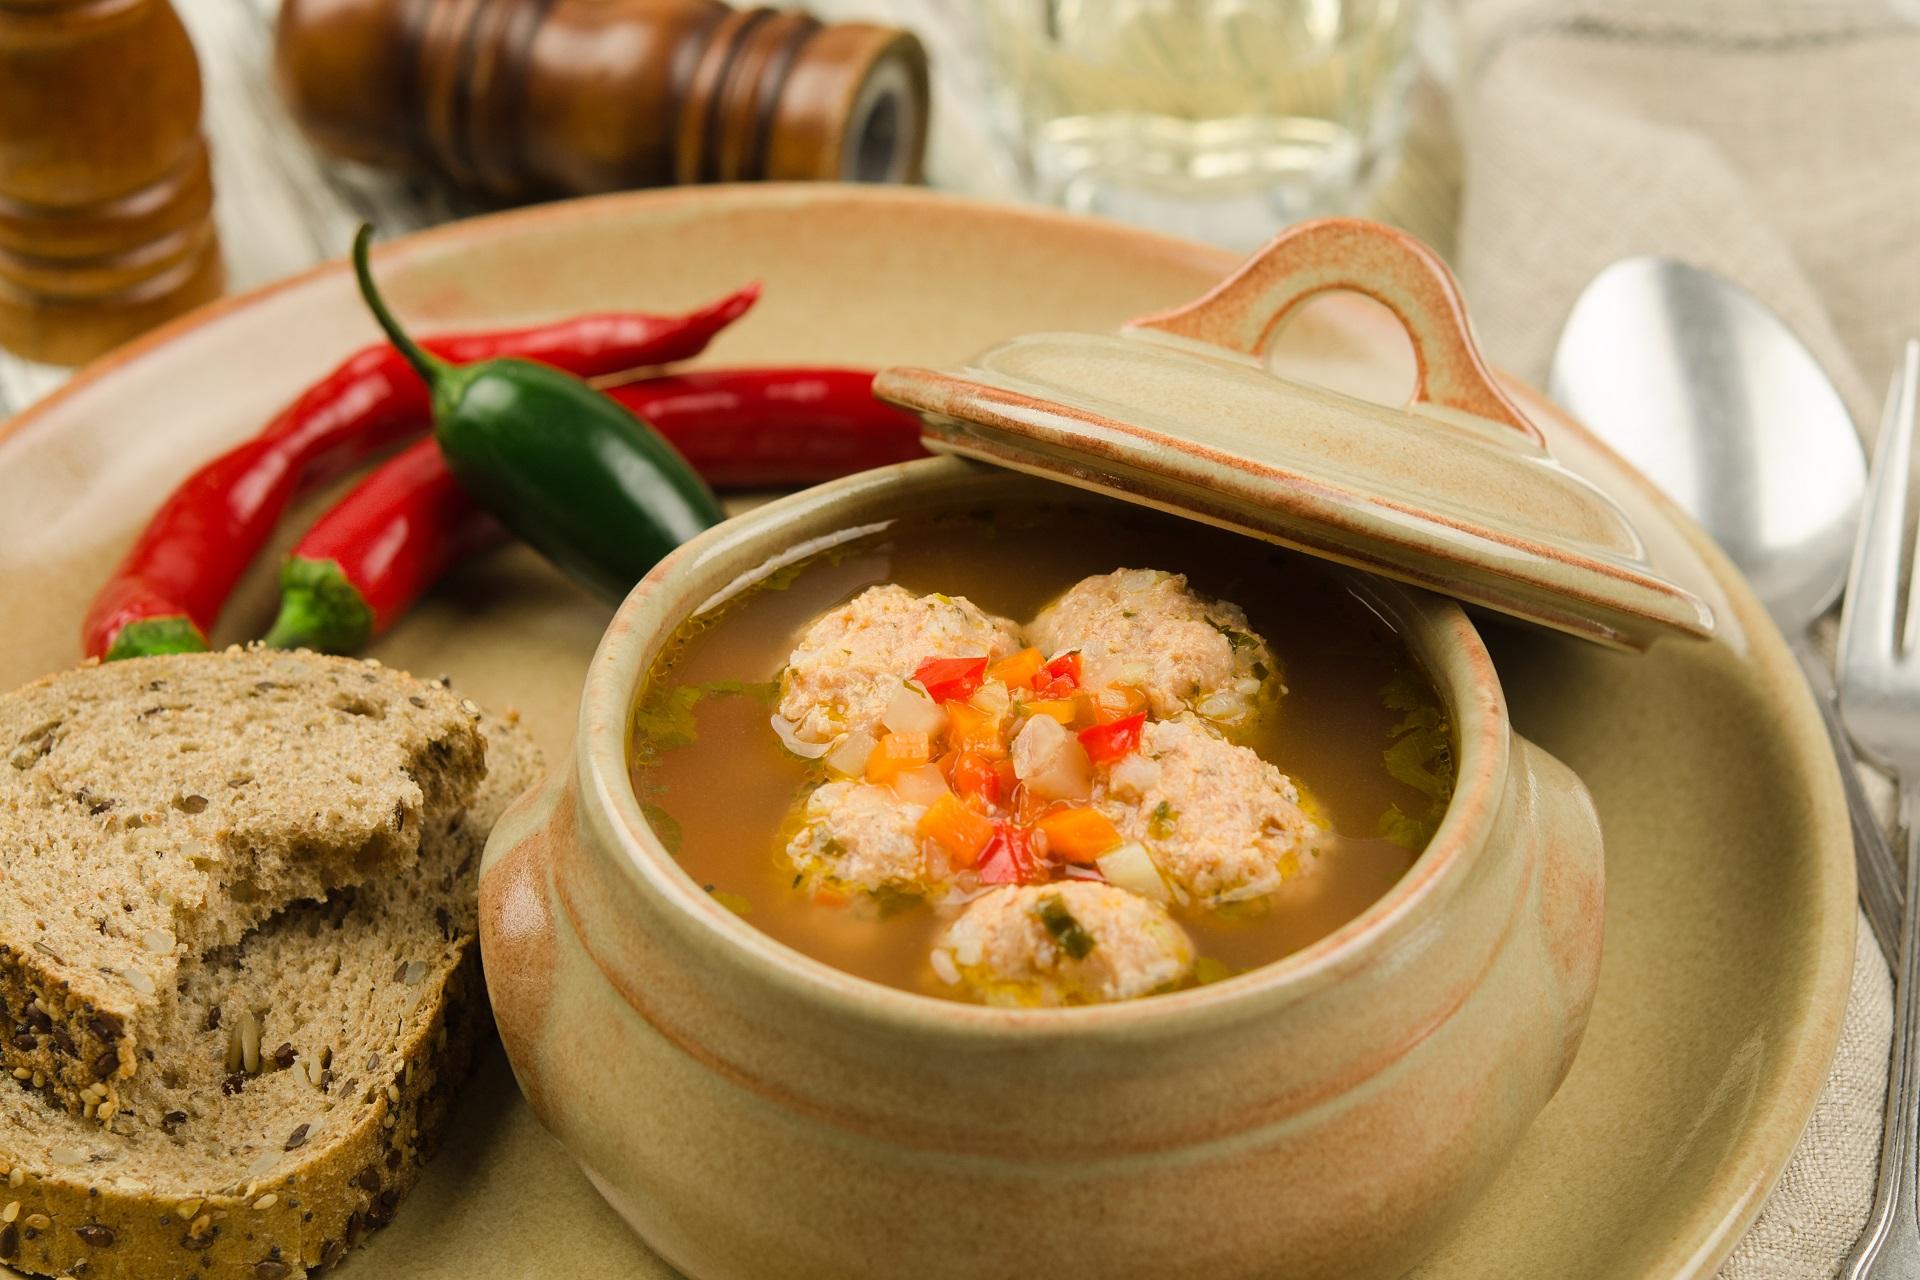 Leckere ketogene Suppe mit Knochenbrühe